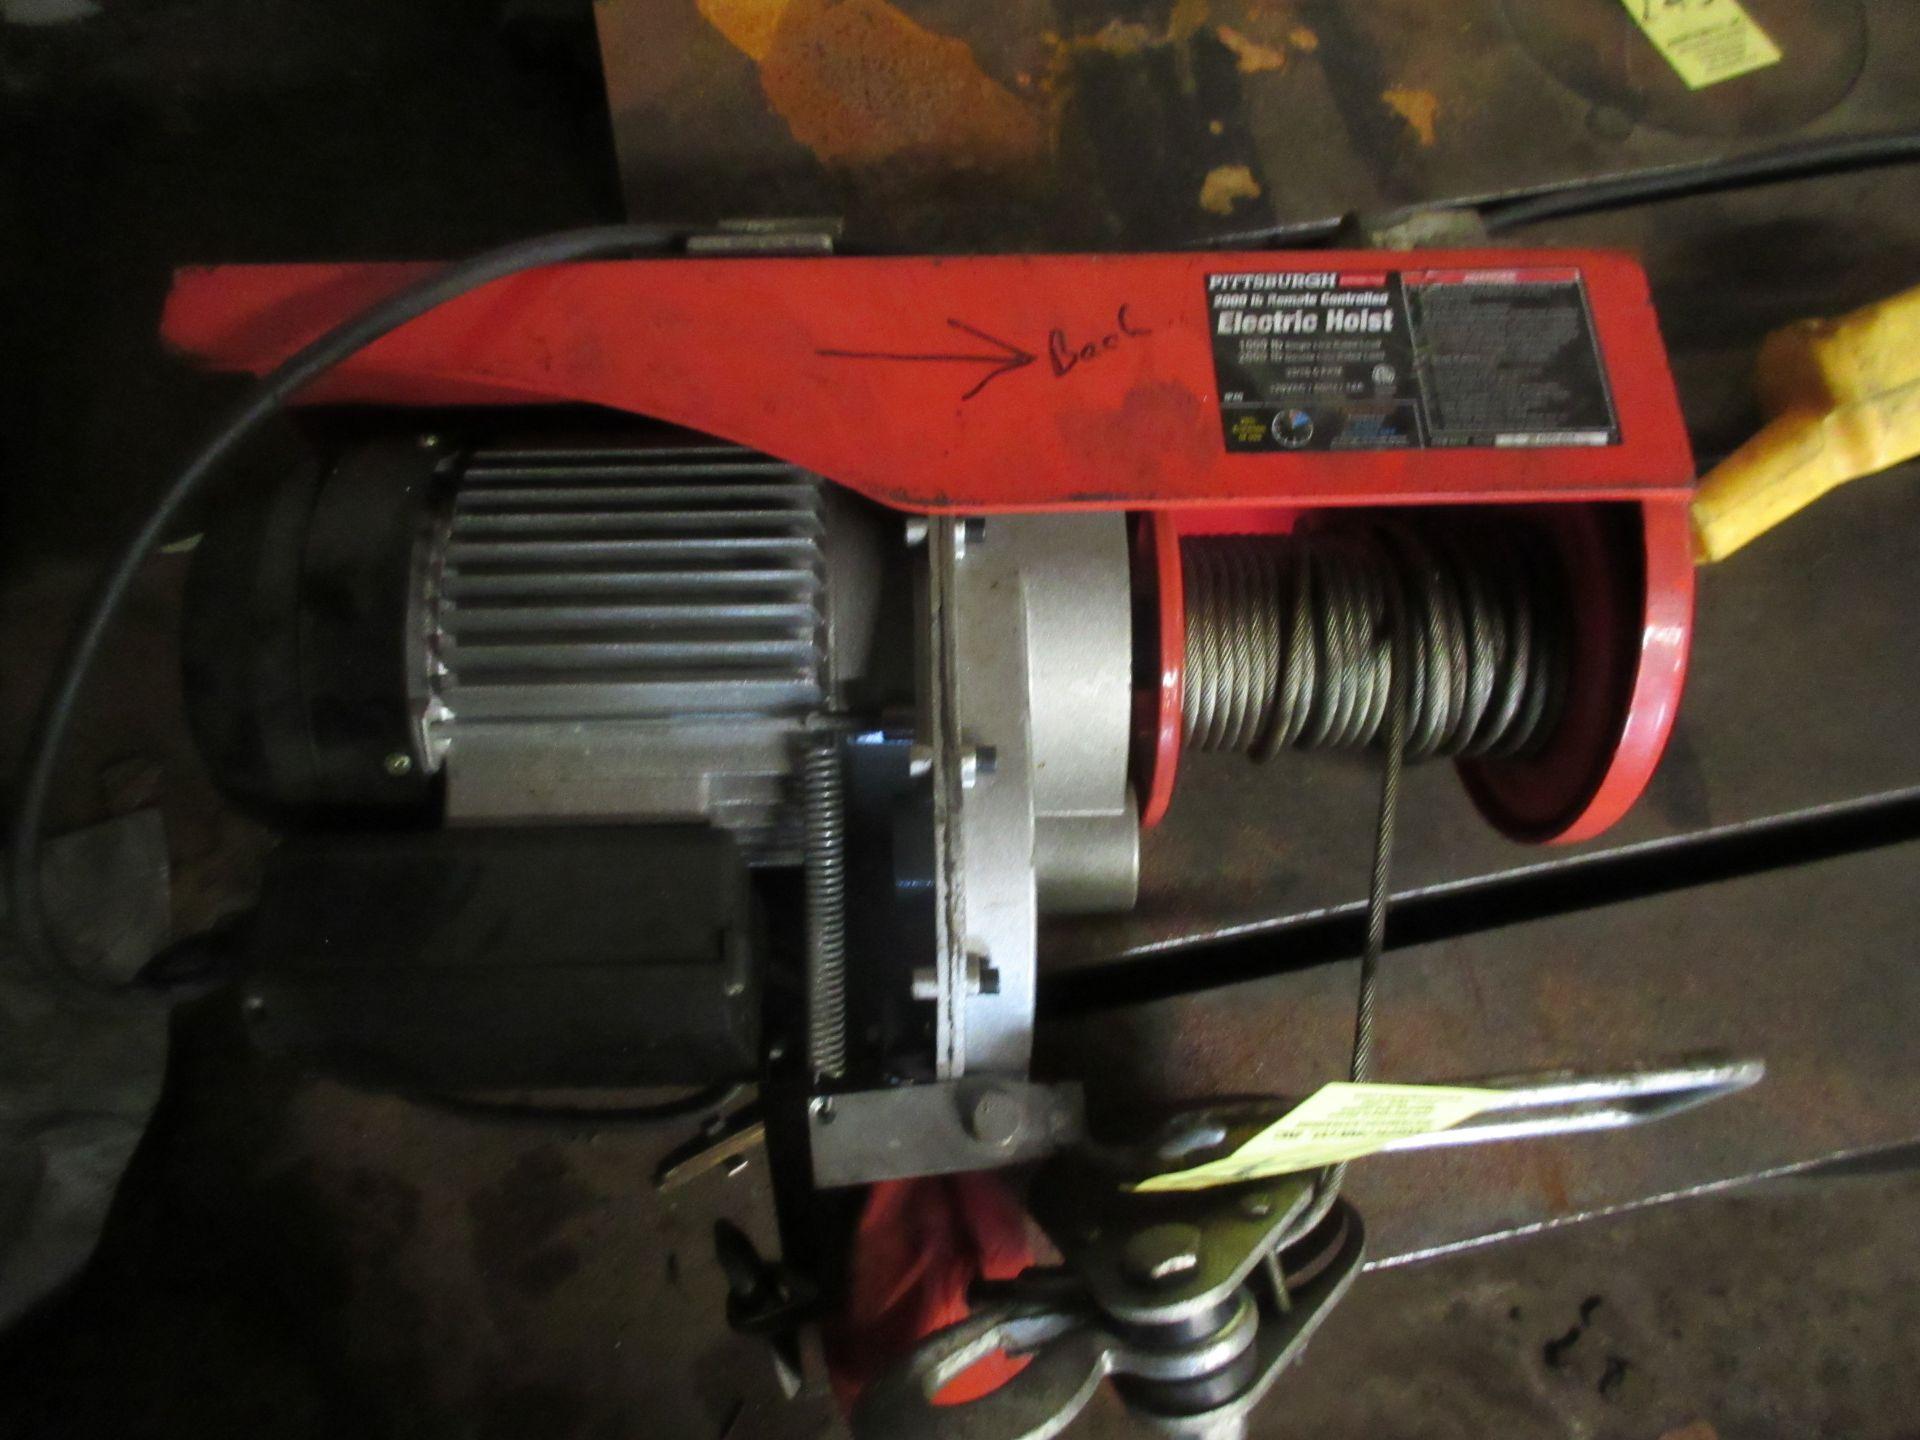 (1) Pittsburgh 2000 K. Remote Control Electric Hoist